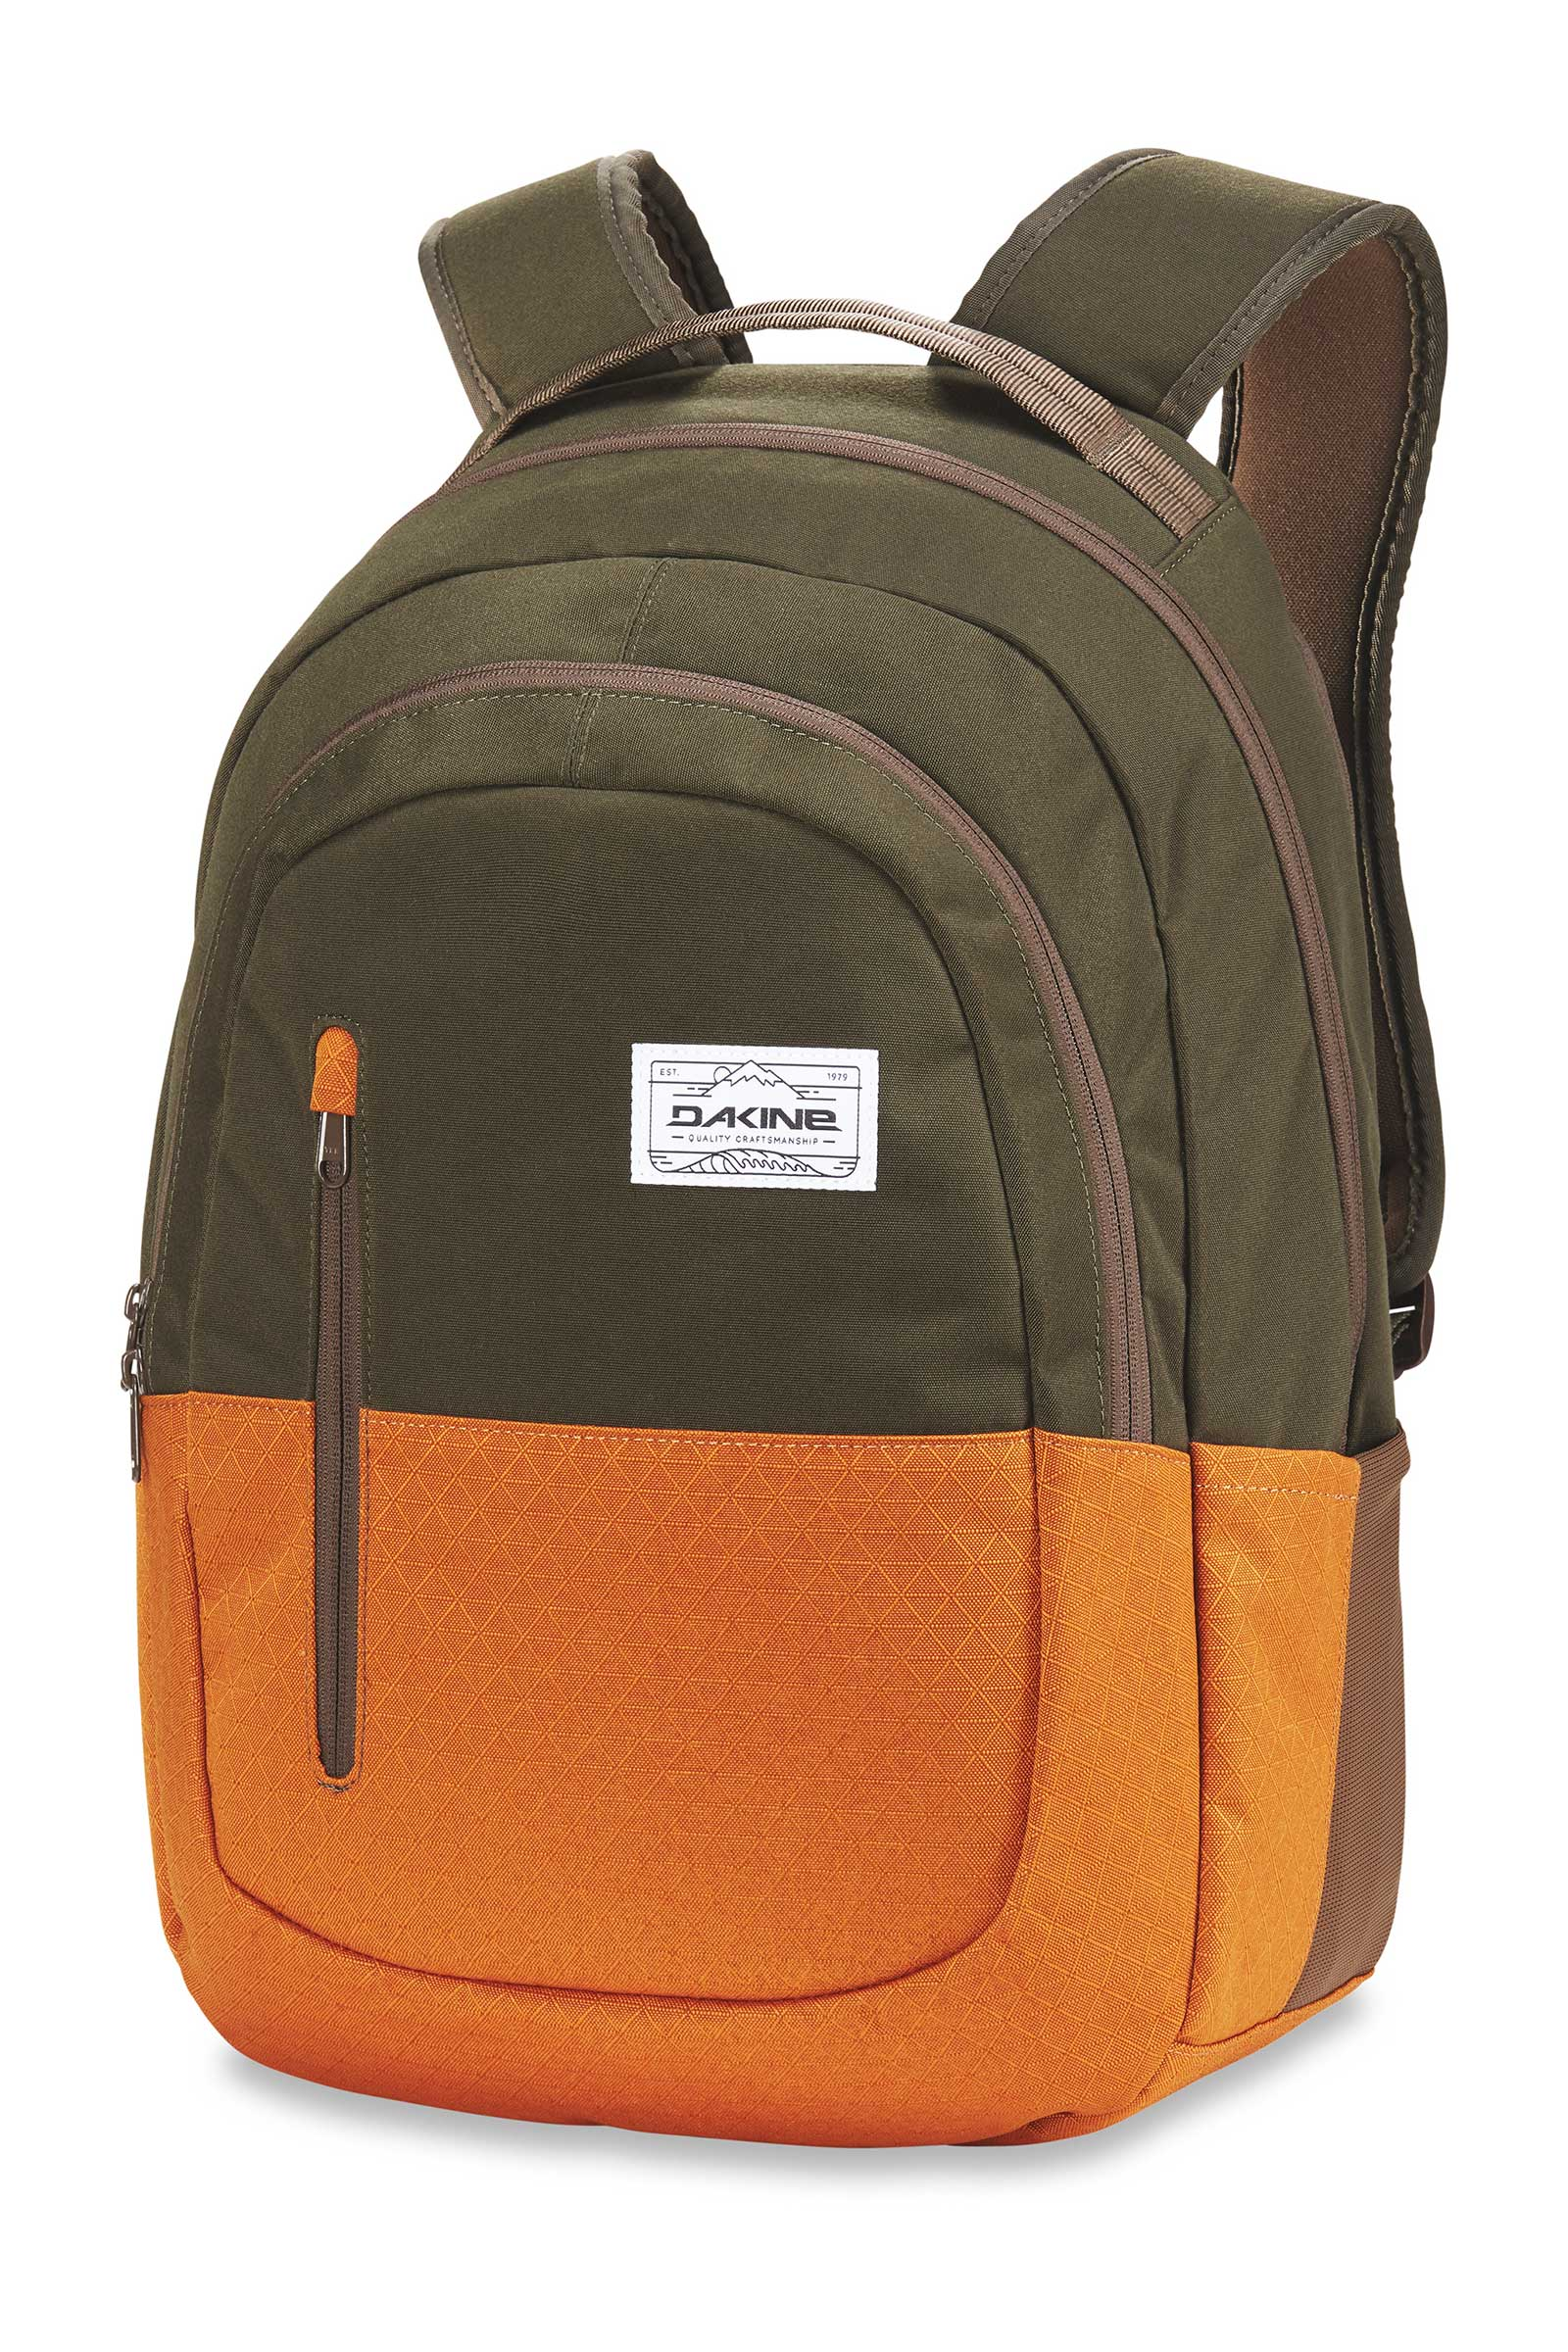 4aa5a8d1c3549 Backpacks - The Board Basement